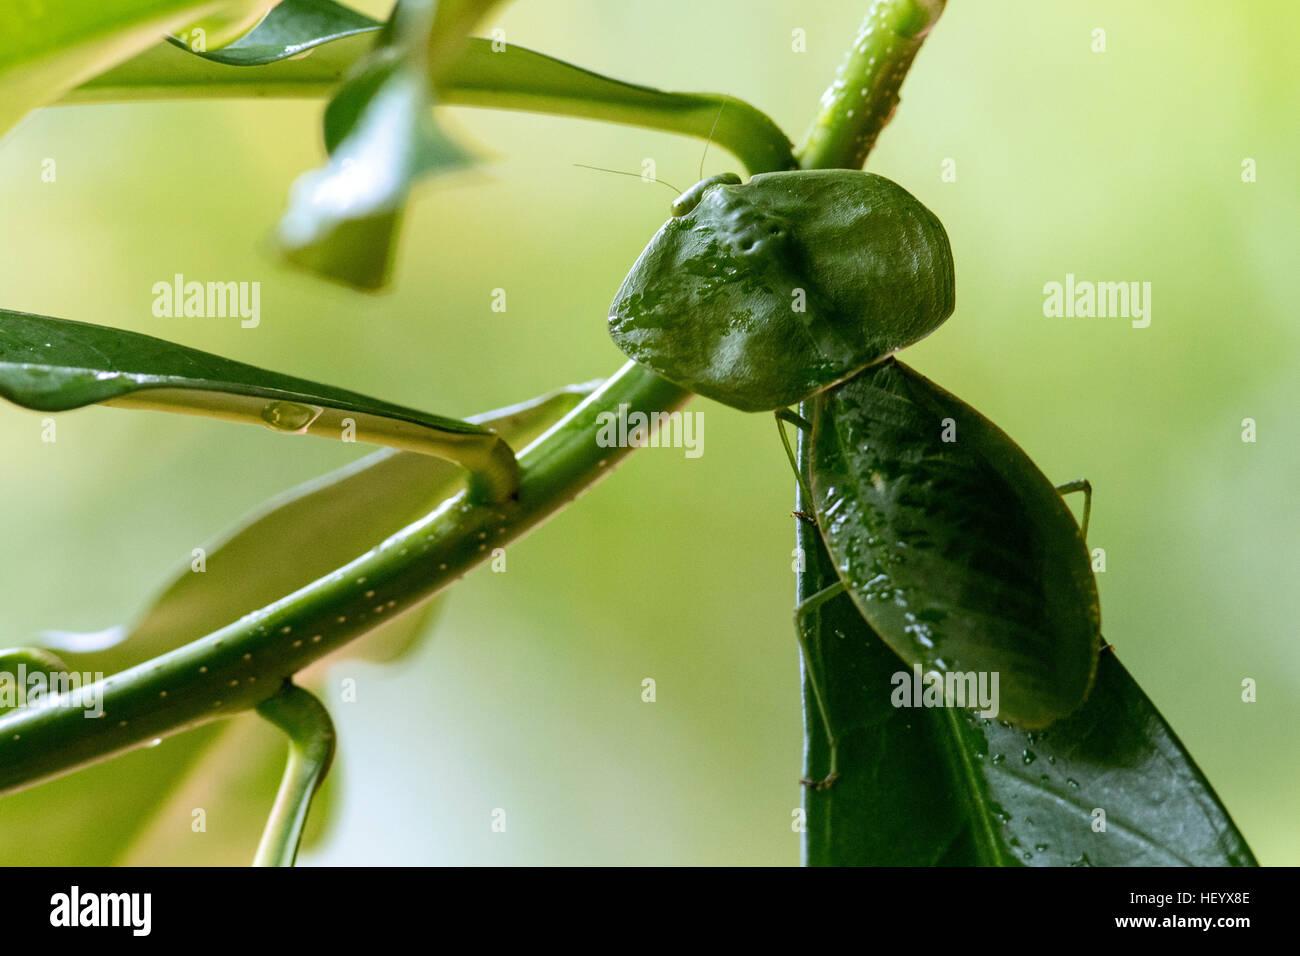 Green Leaf-mimic Praying Mantis - Laguna del lagarto Lodge, Boca Tapada; Costa Rica - Stock Image